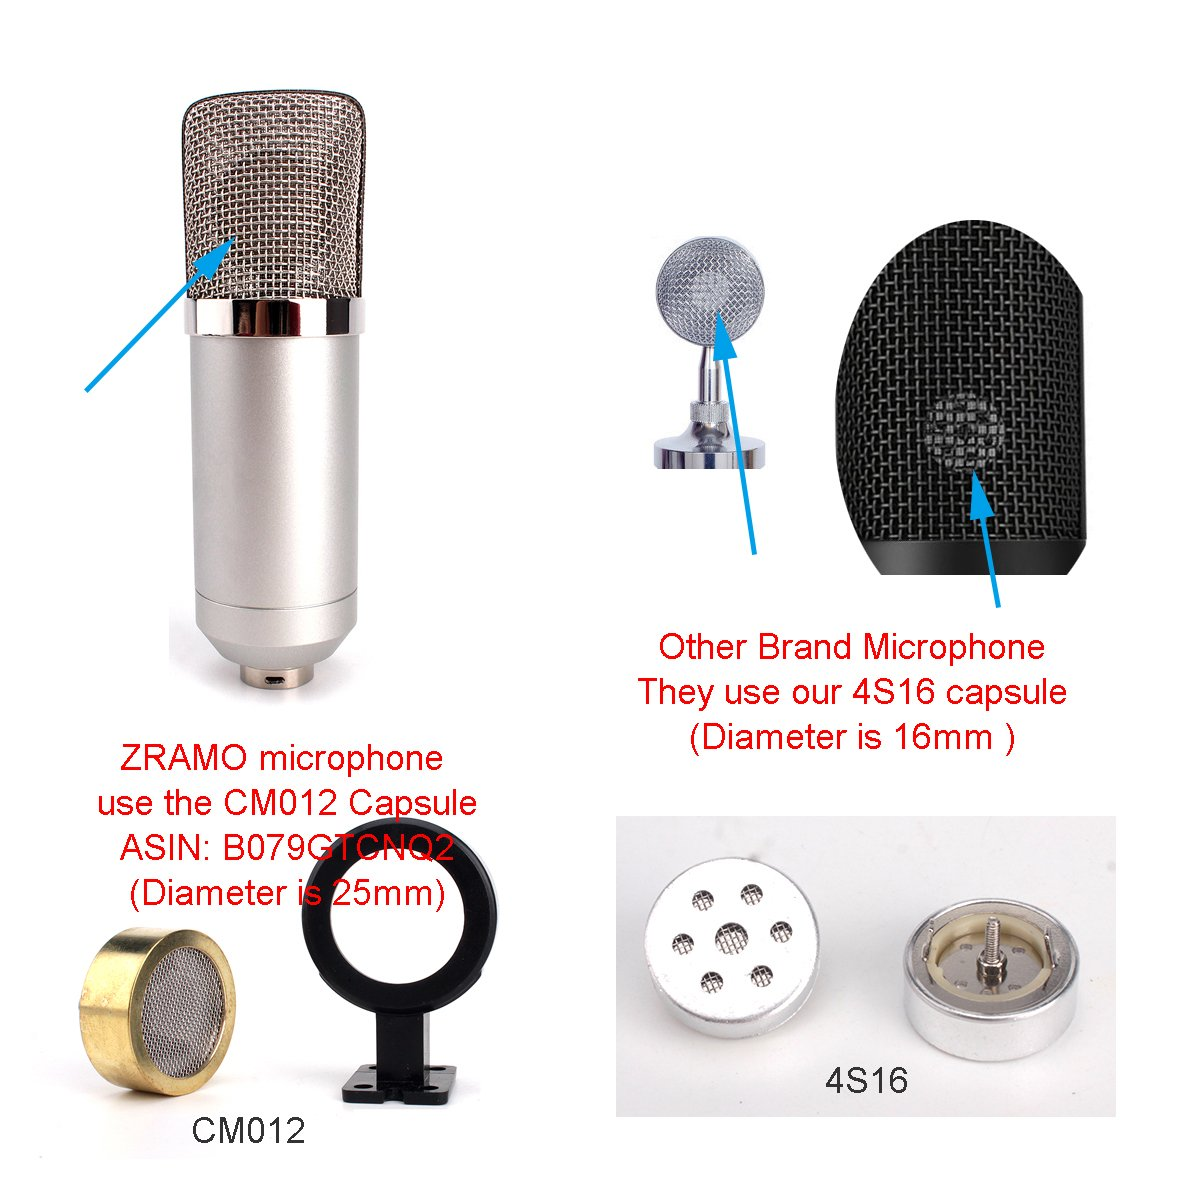 Zramo 34mm large diagram condenser mic capsule for recording zramo 34mm large diagram condenser mic capsule for recording microphone studio professional mic computer pc use ccuart Images